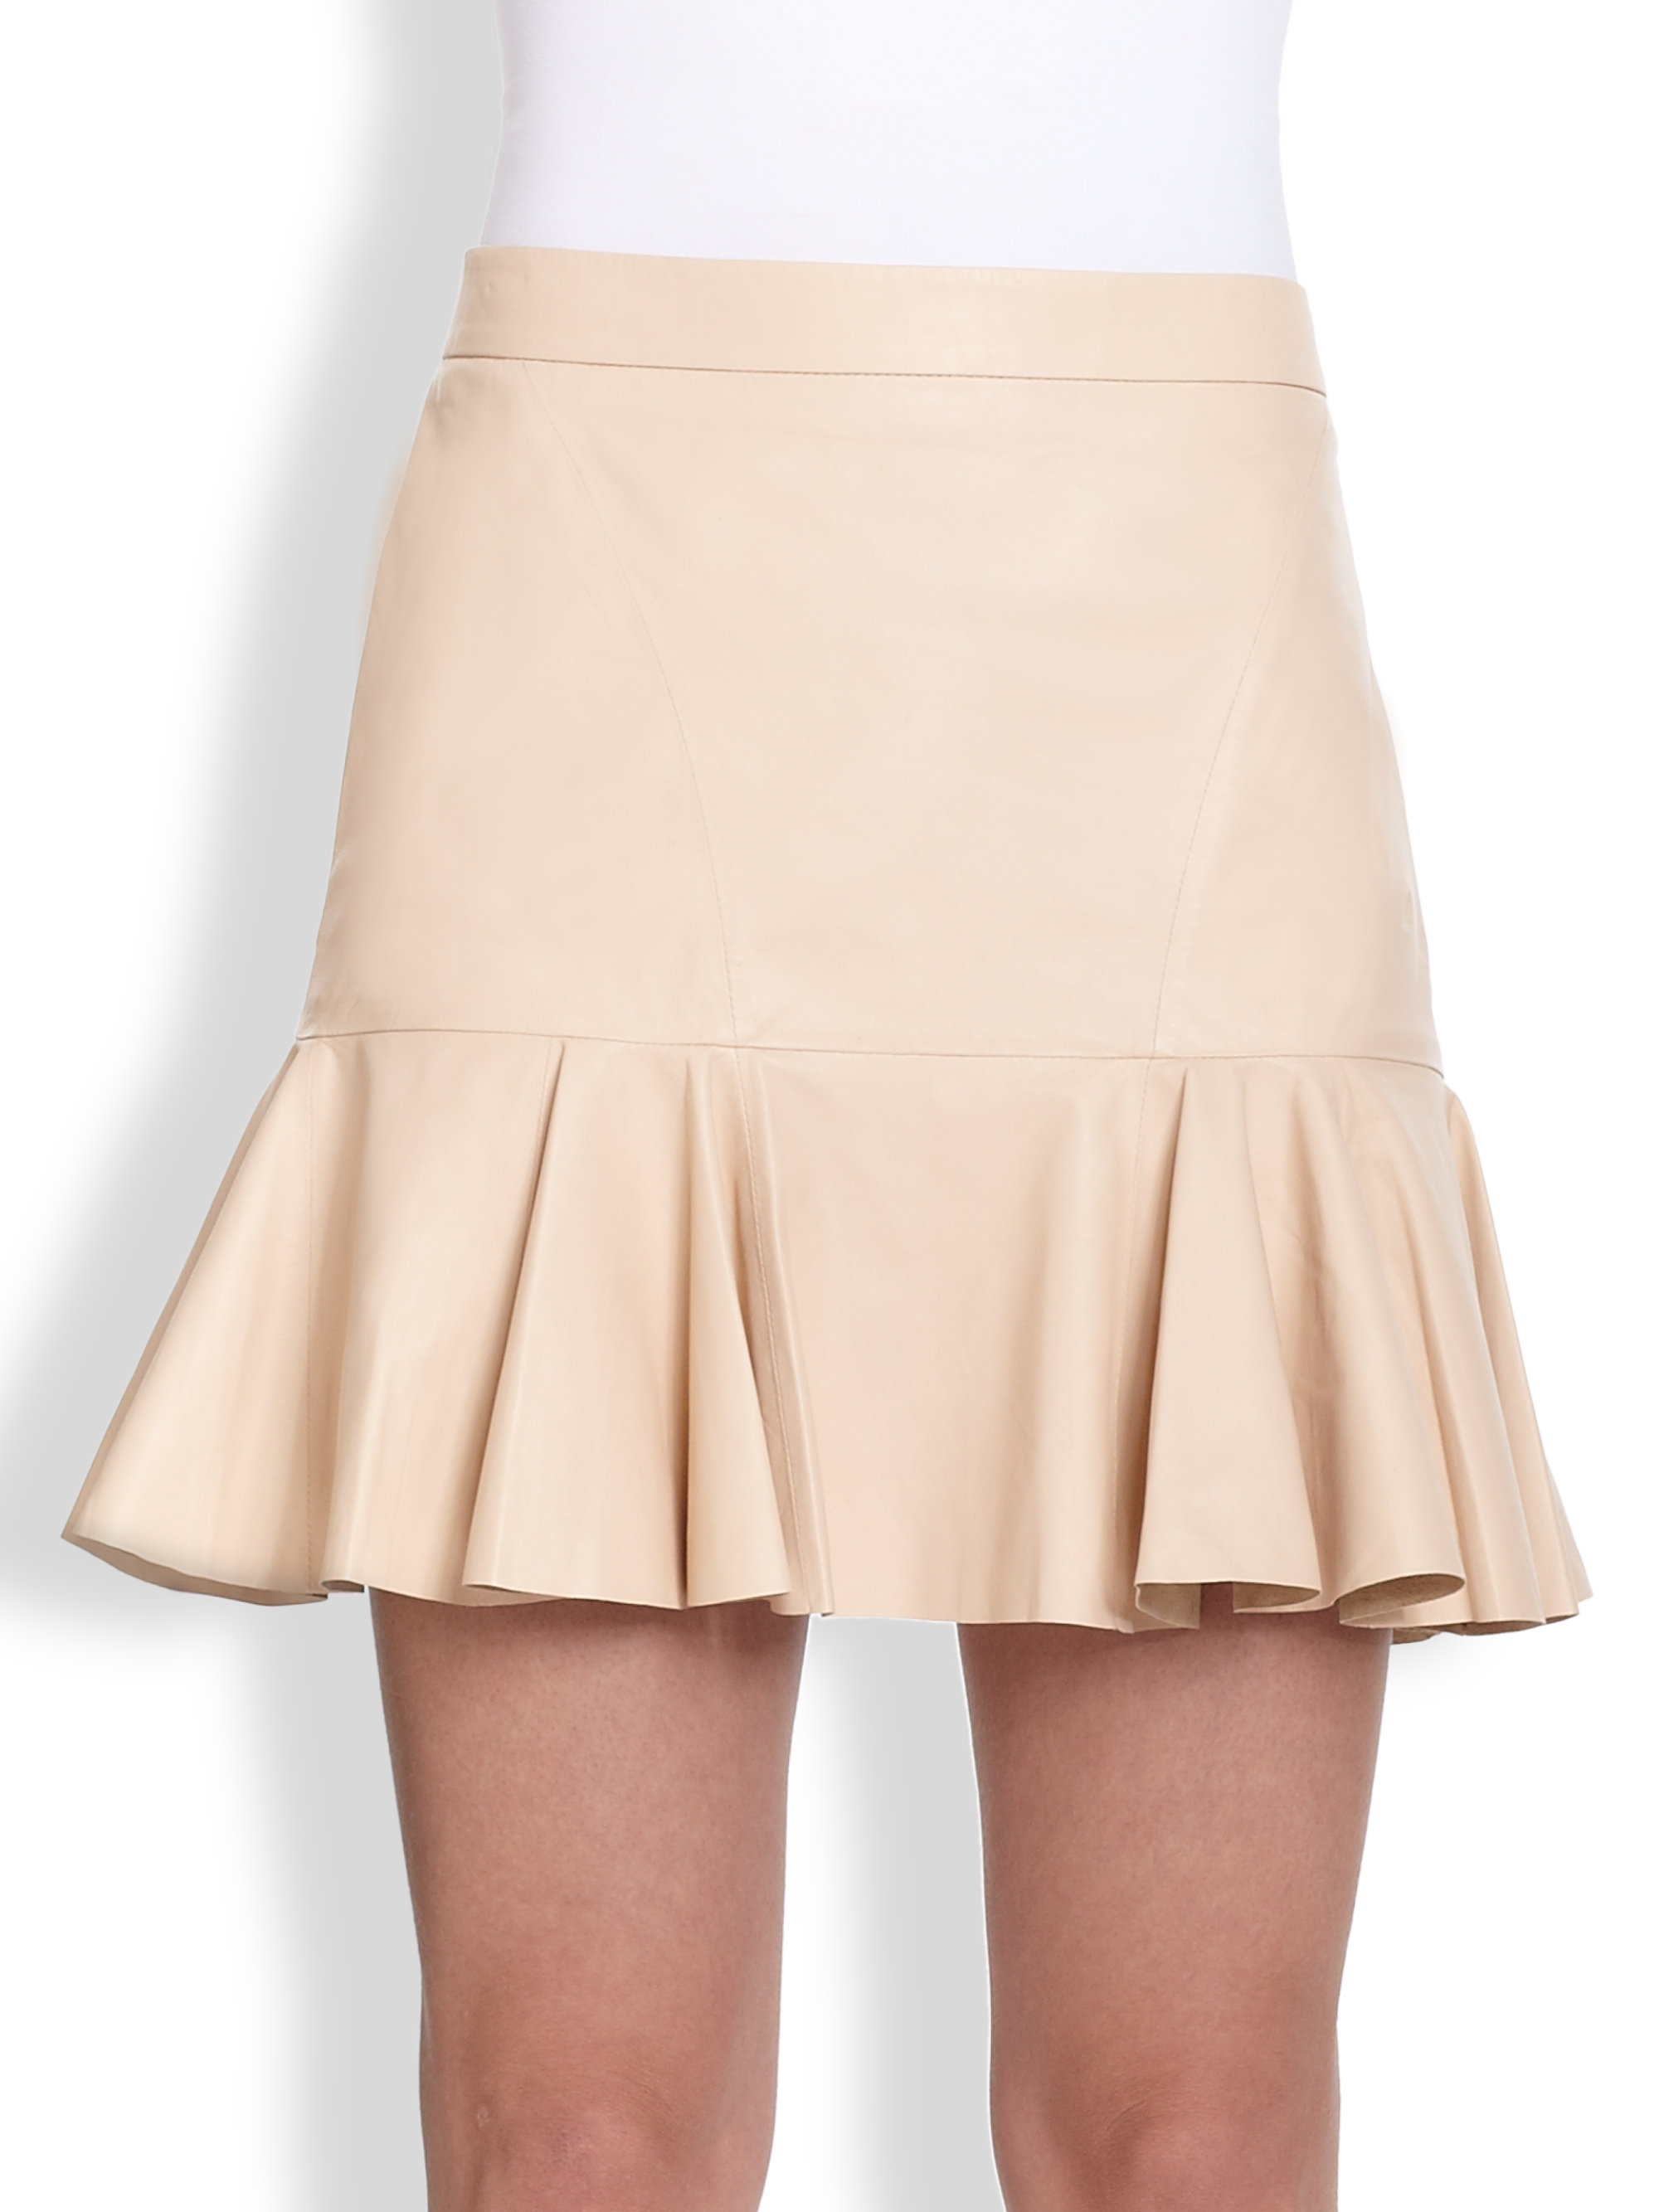 Leather frill skirt – Modern skirts blog for you